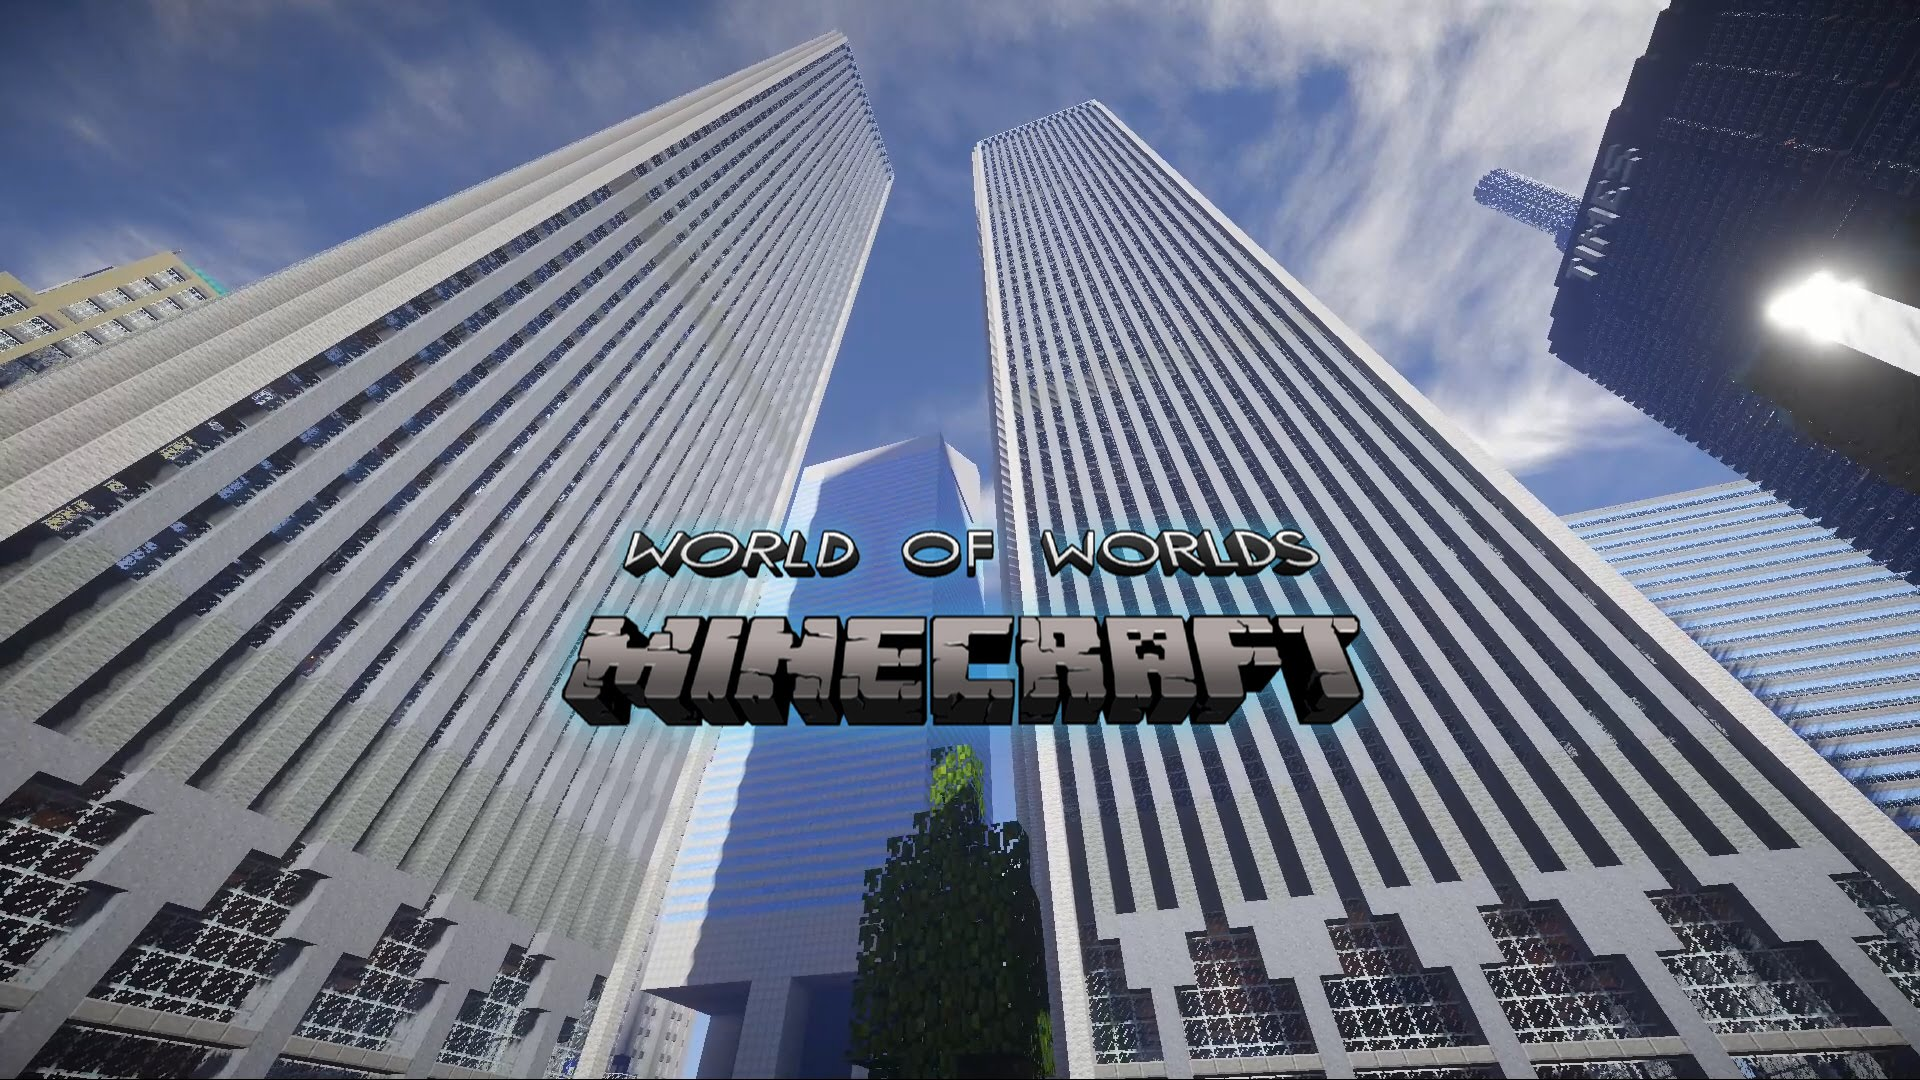 World of Worlds 2.8